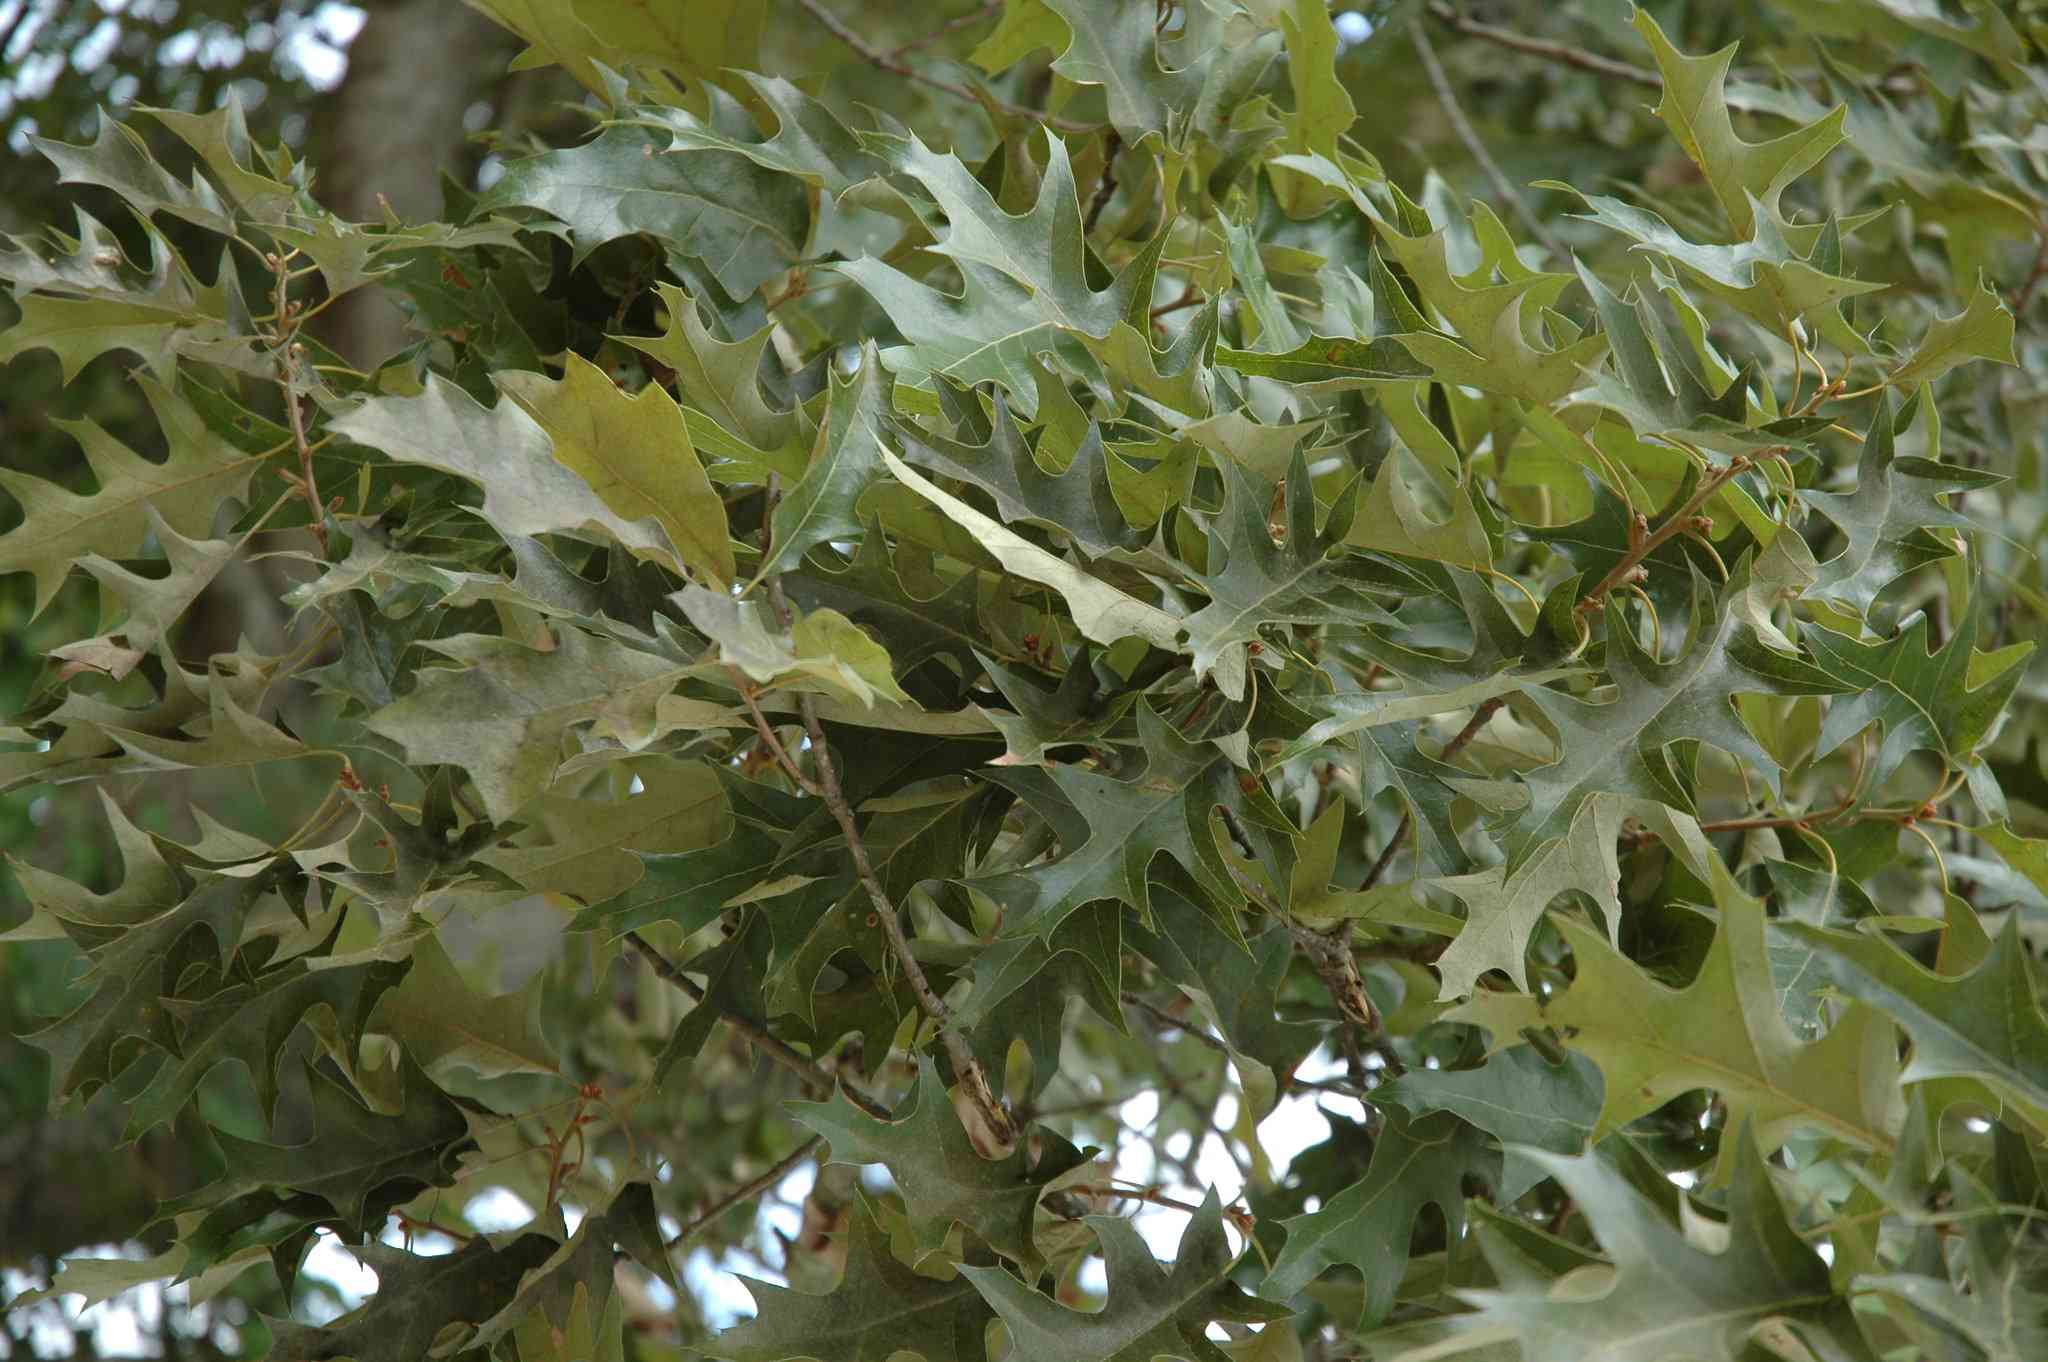 Leaves on a Cherrybark Oak tree.